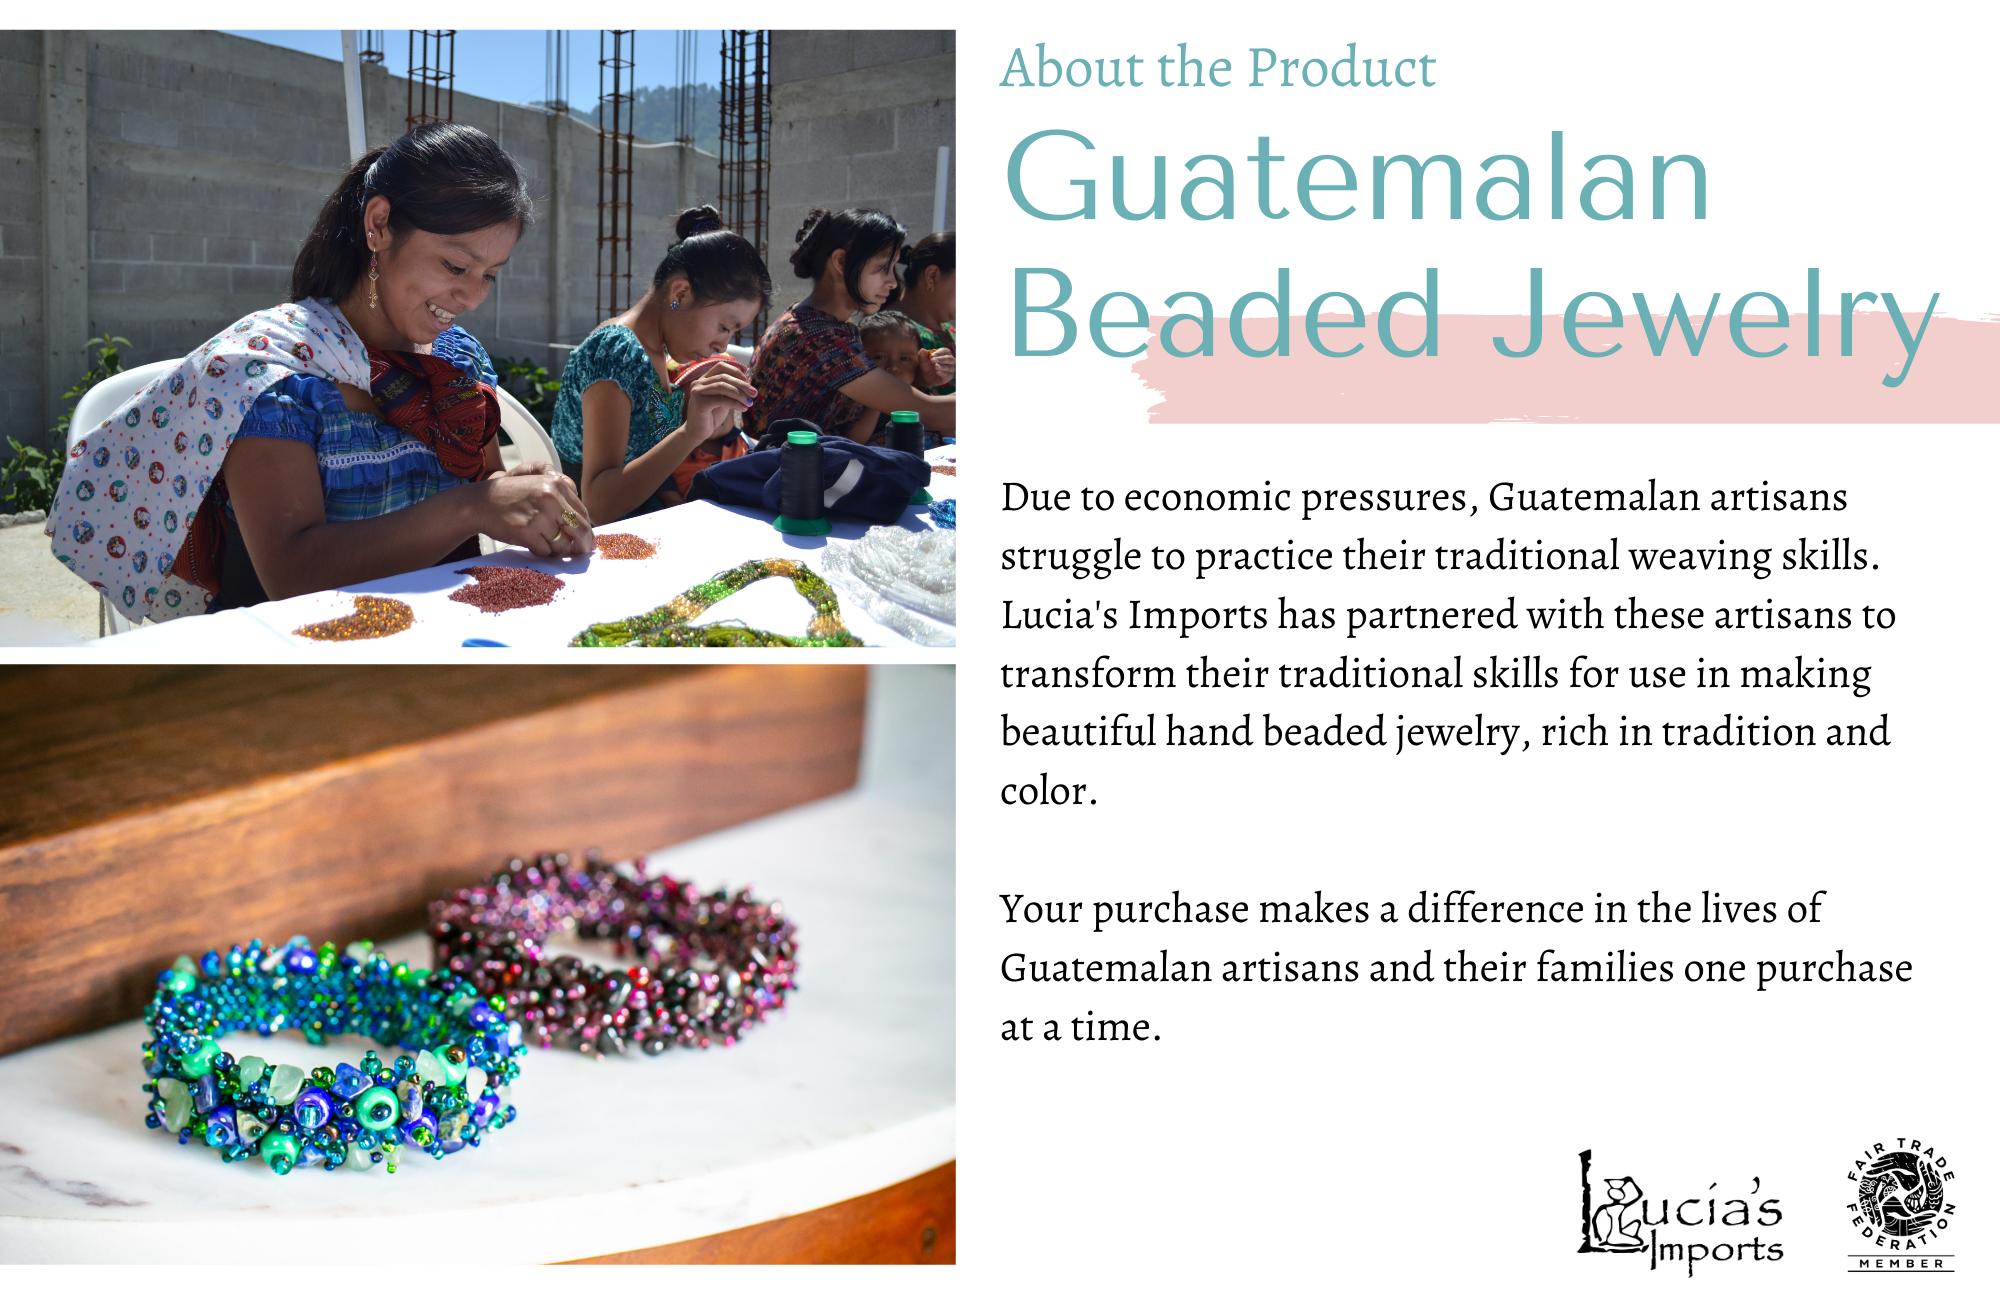 Guatemalan Beaded Jewelry